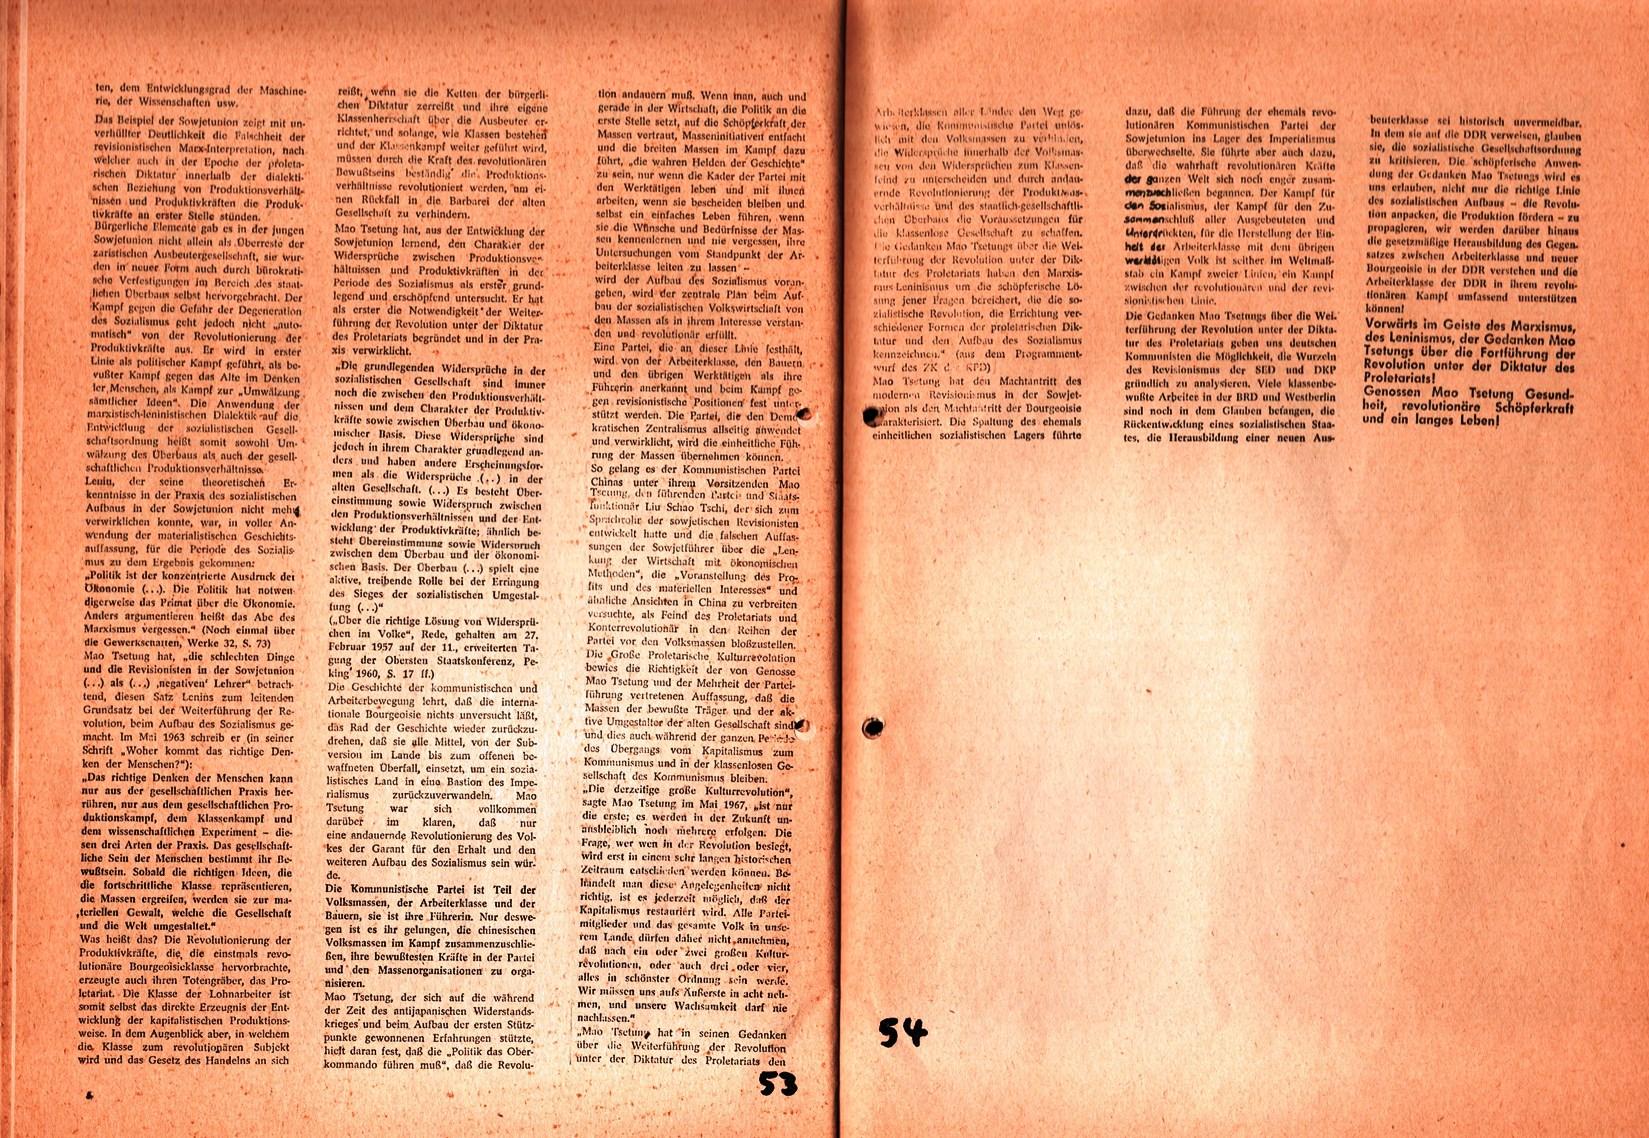 KSV_1974_Materialien_zur_Programmdiskussion_01_028